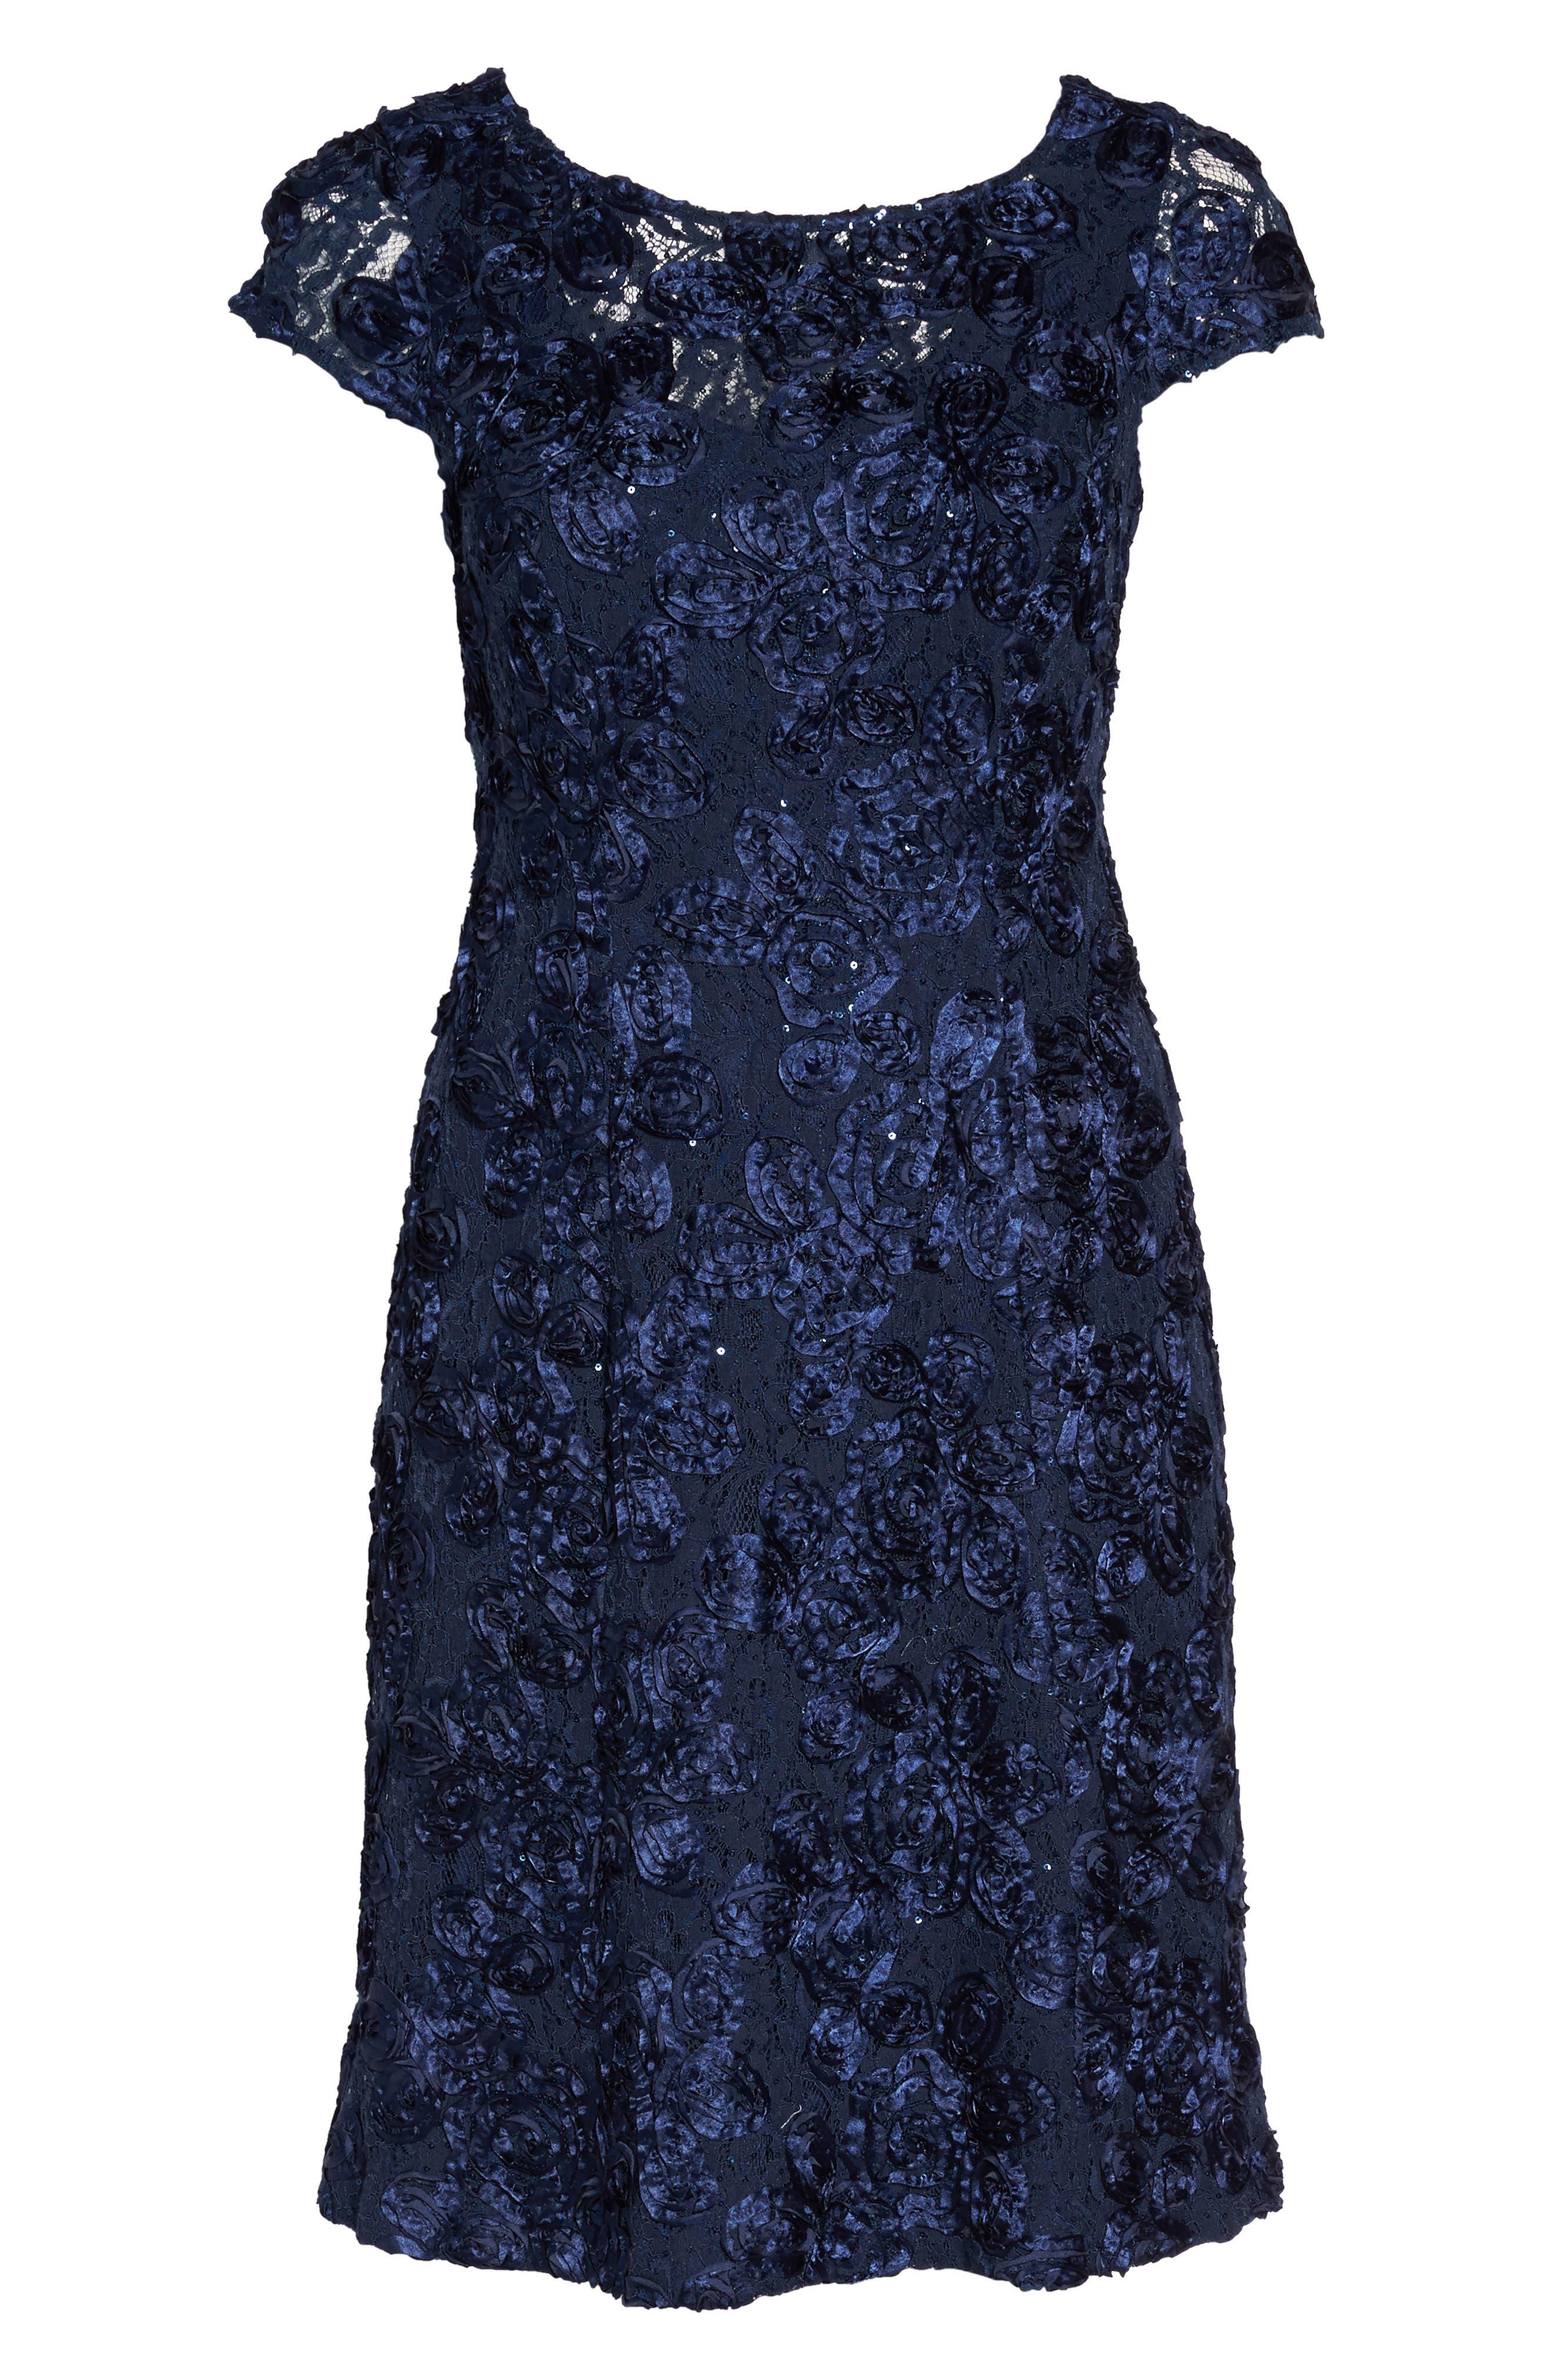 Rosette Fit & Flare Dress,                             Alternate thumbnail 6, color,                             410